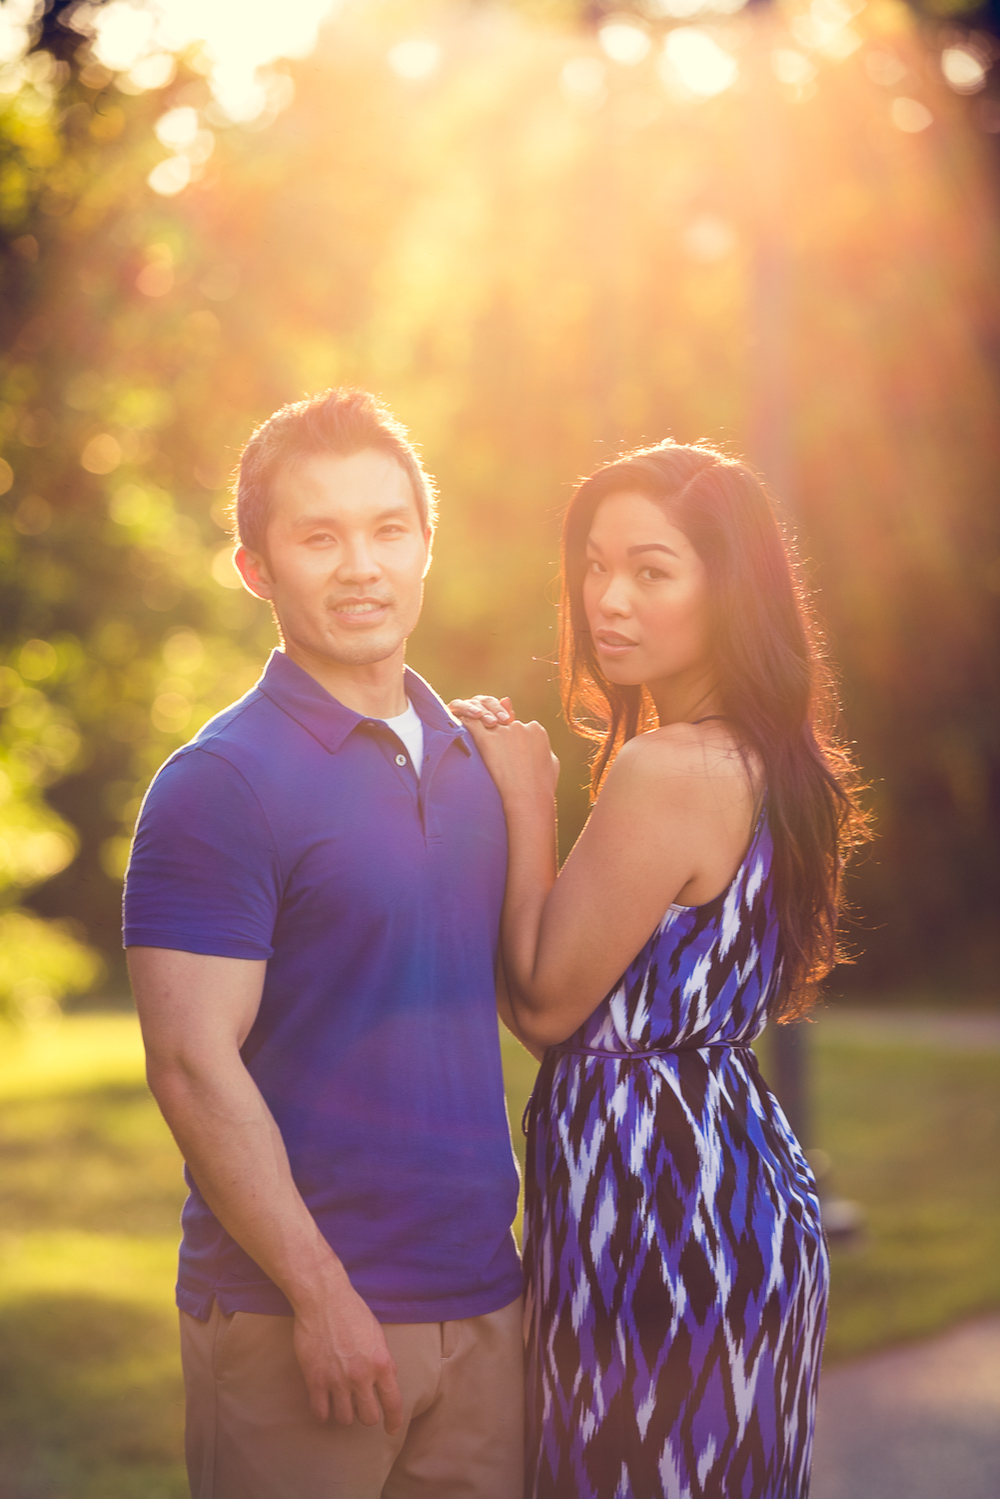 20160705 - Justine Wu Engagement Pix LR-29.jpg